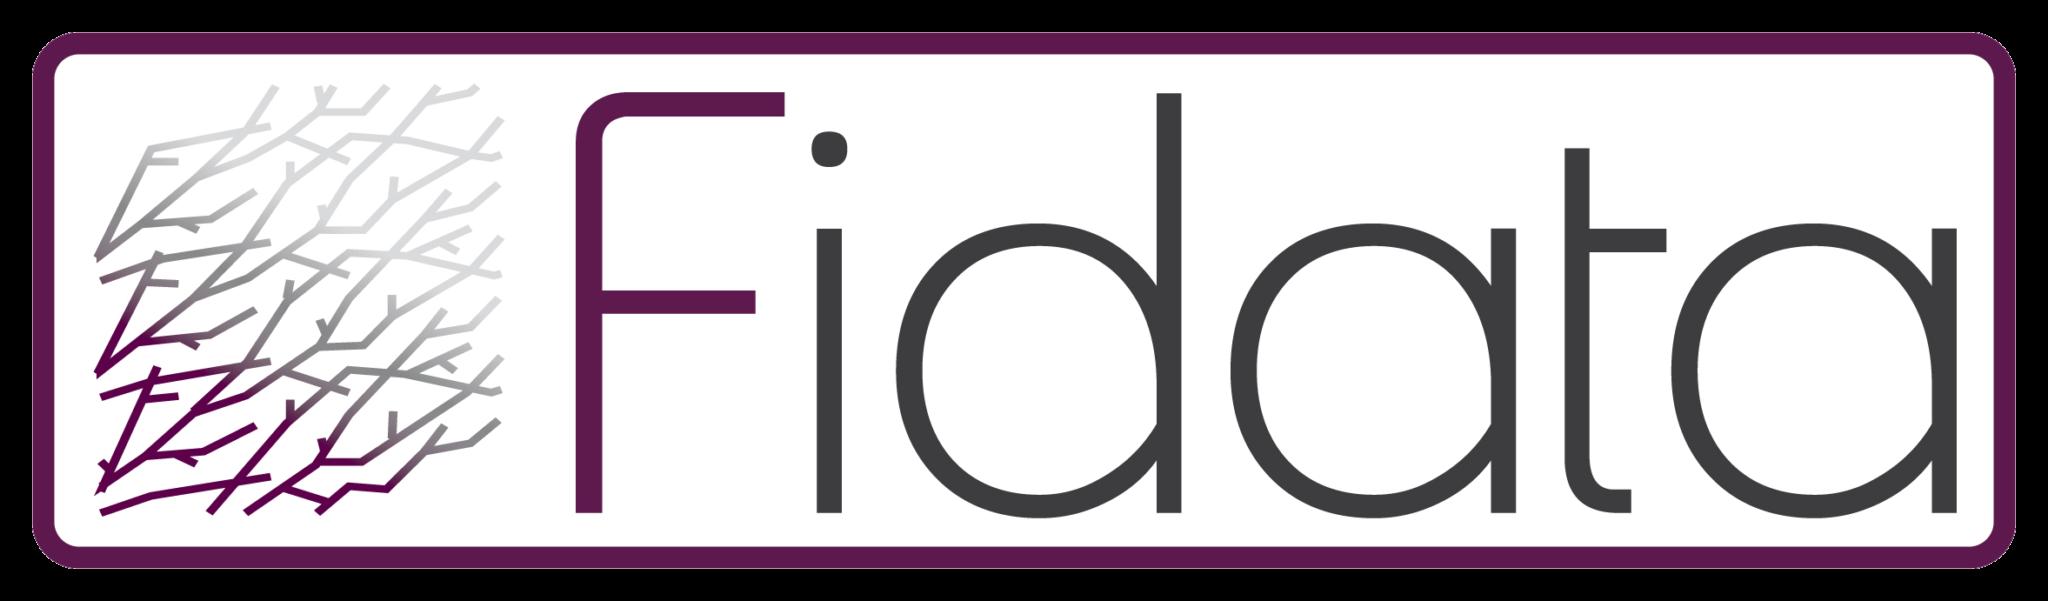 Fidata logo